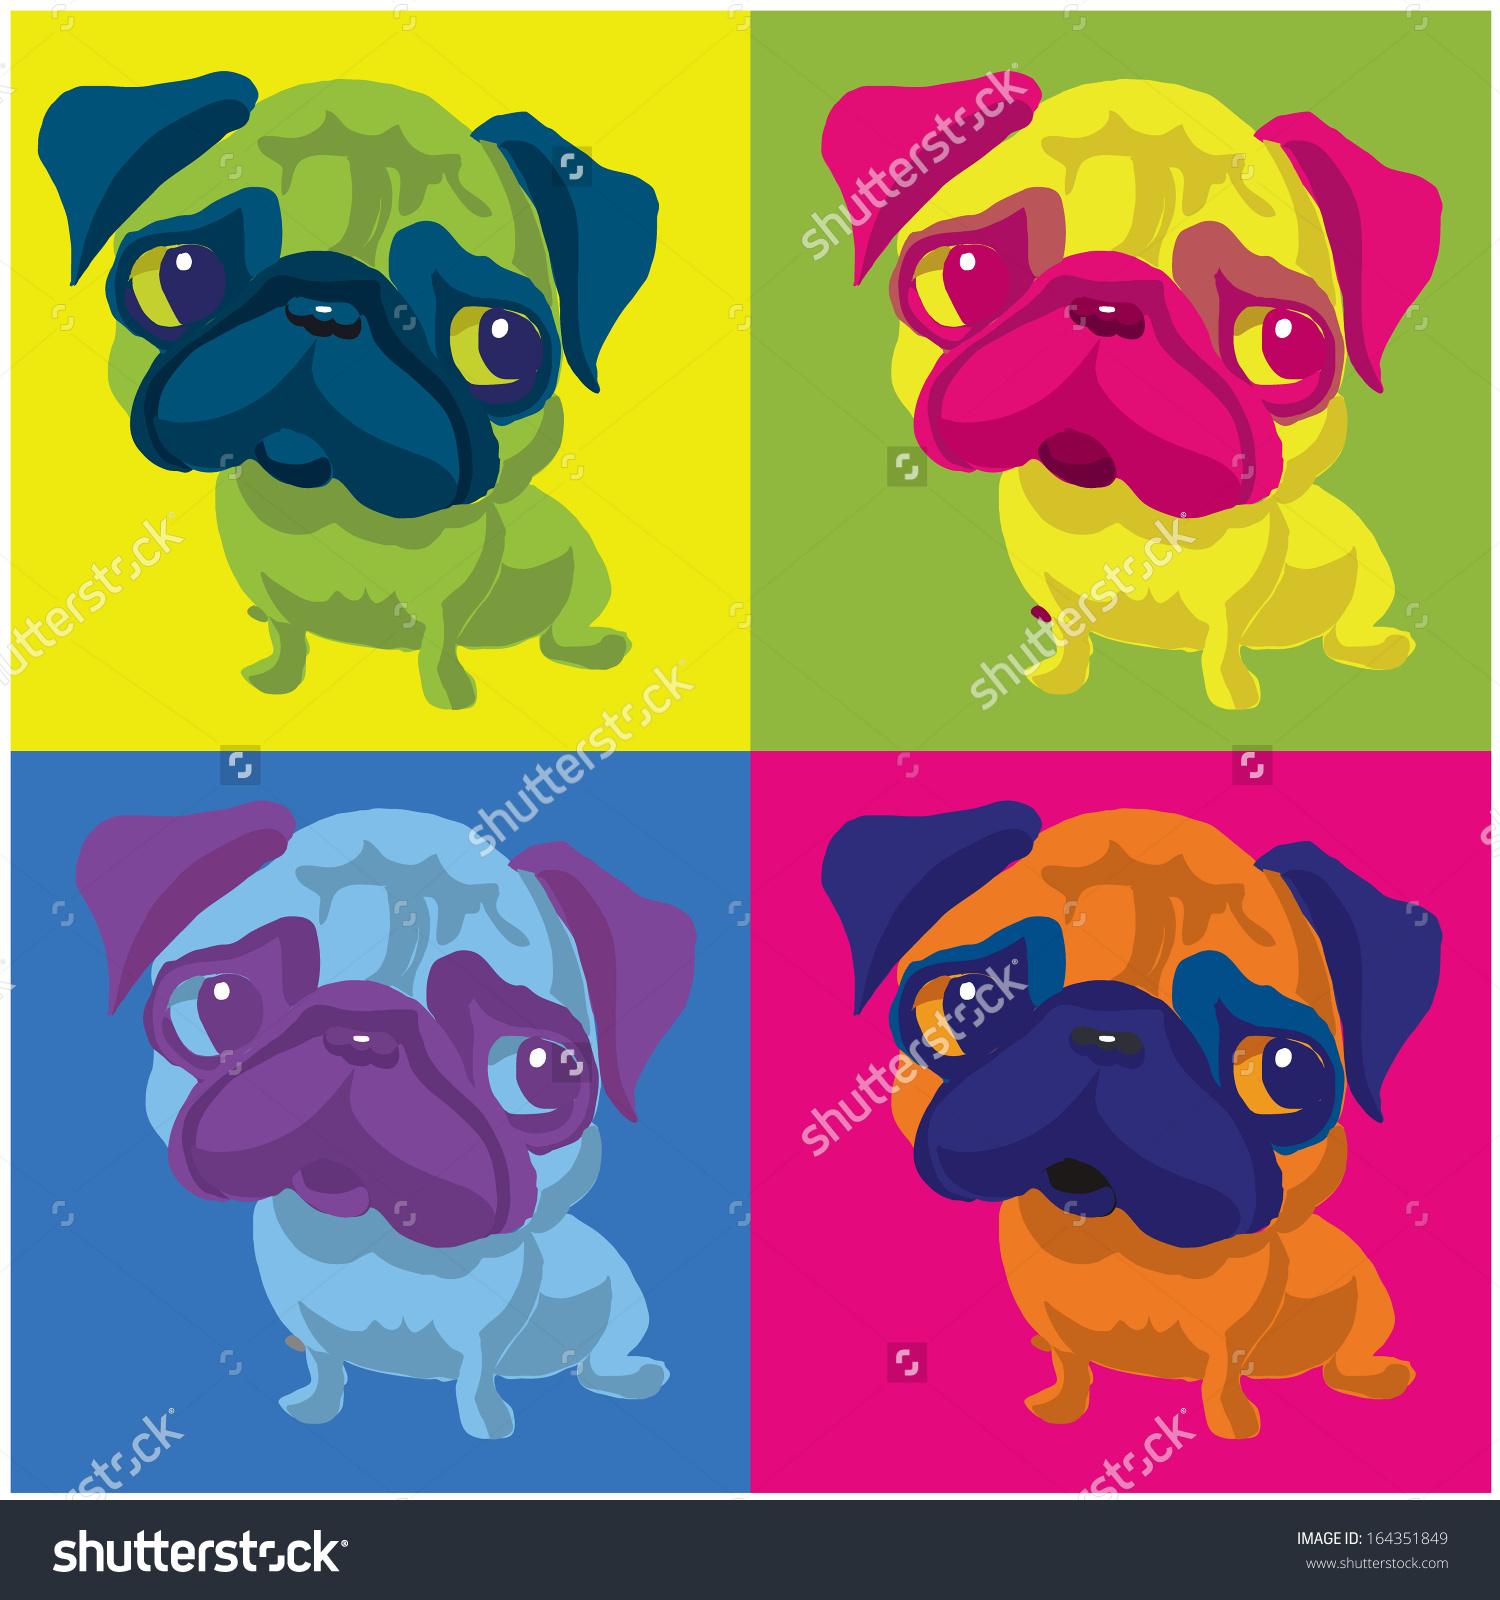 Pug Dog Andy Warhol Style Stock Vector 164351849.